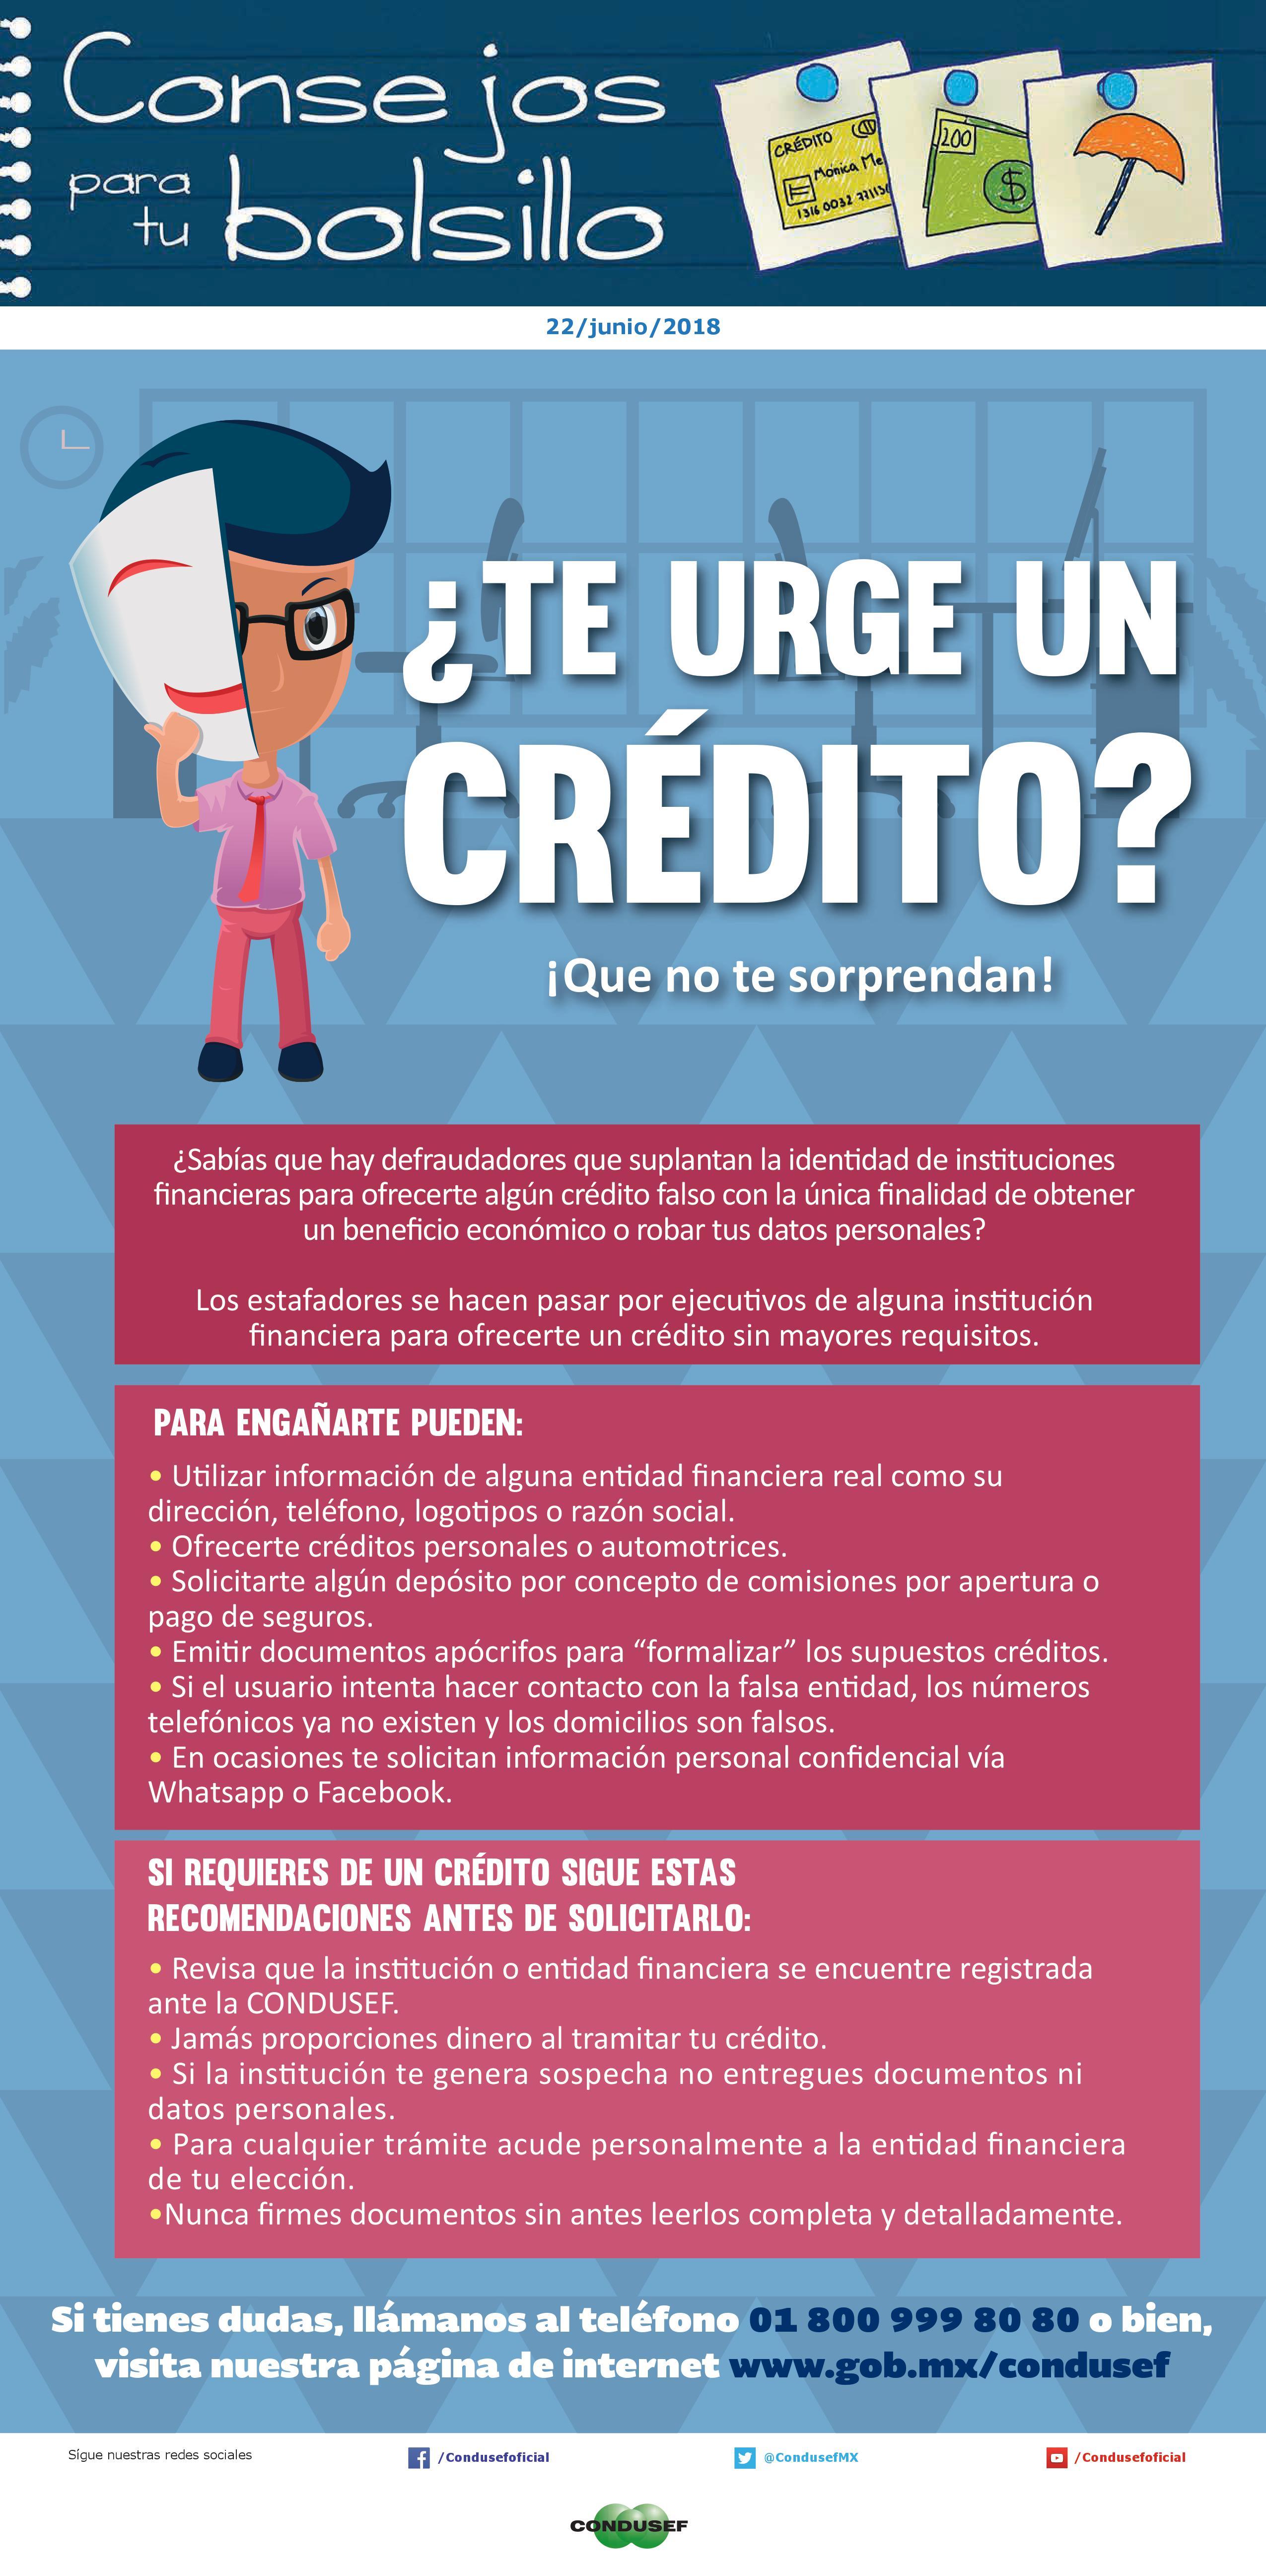 ¿Te urge un crédito?